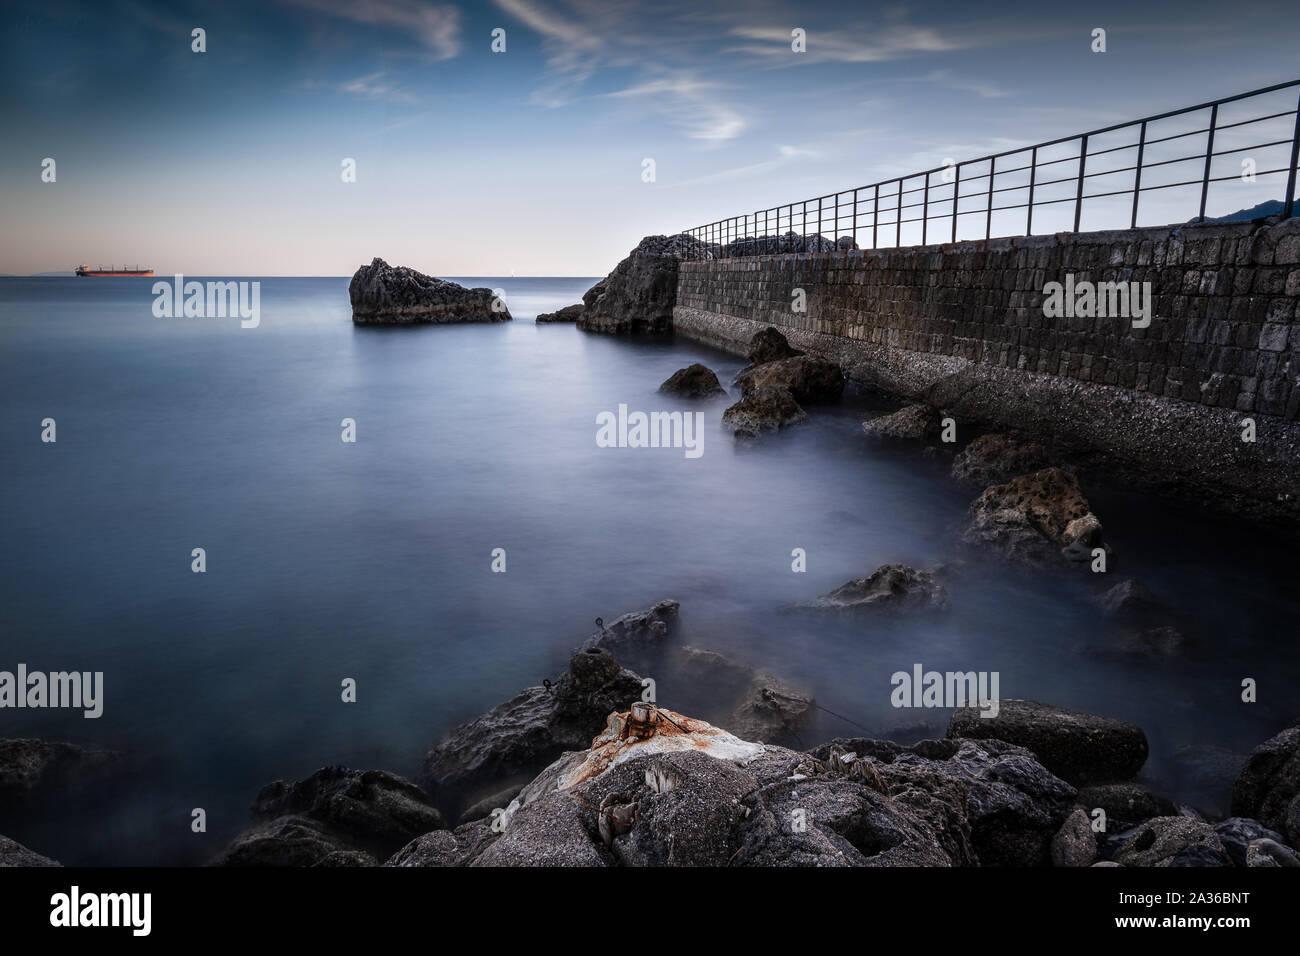 Corner of the Amalfi coast. Photographic shot taken in Vietri sul mare - Italy Stock Photo